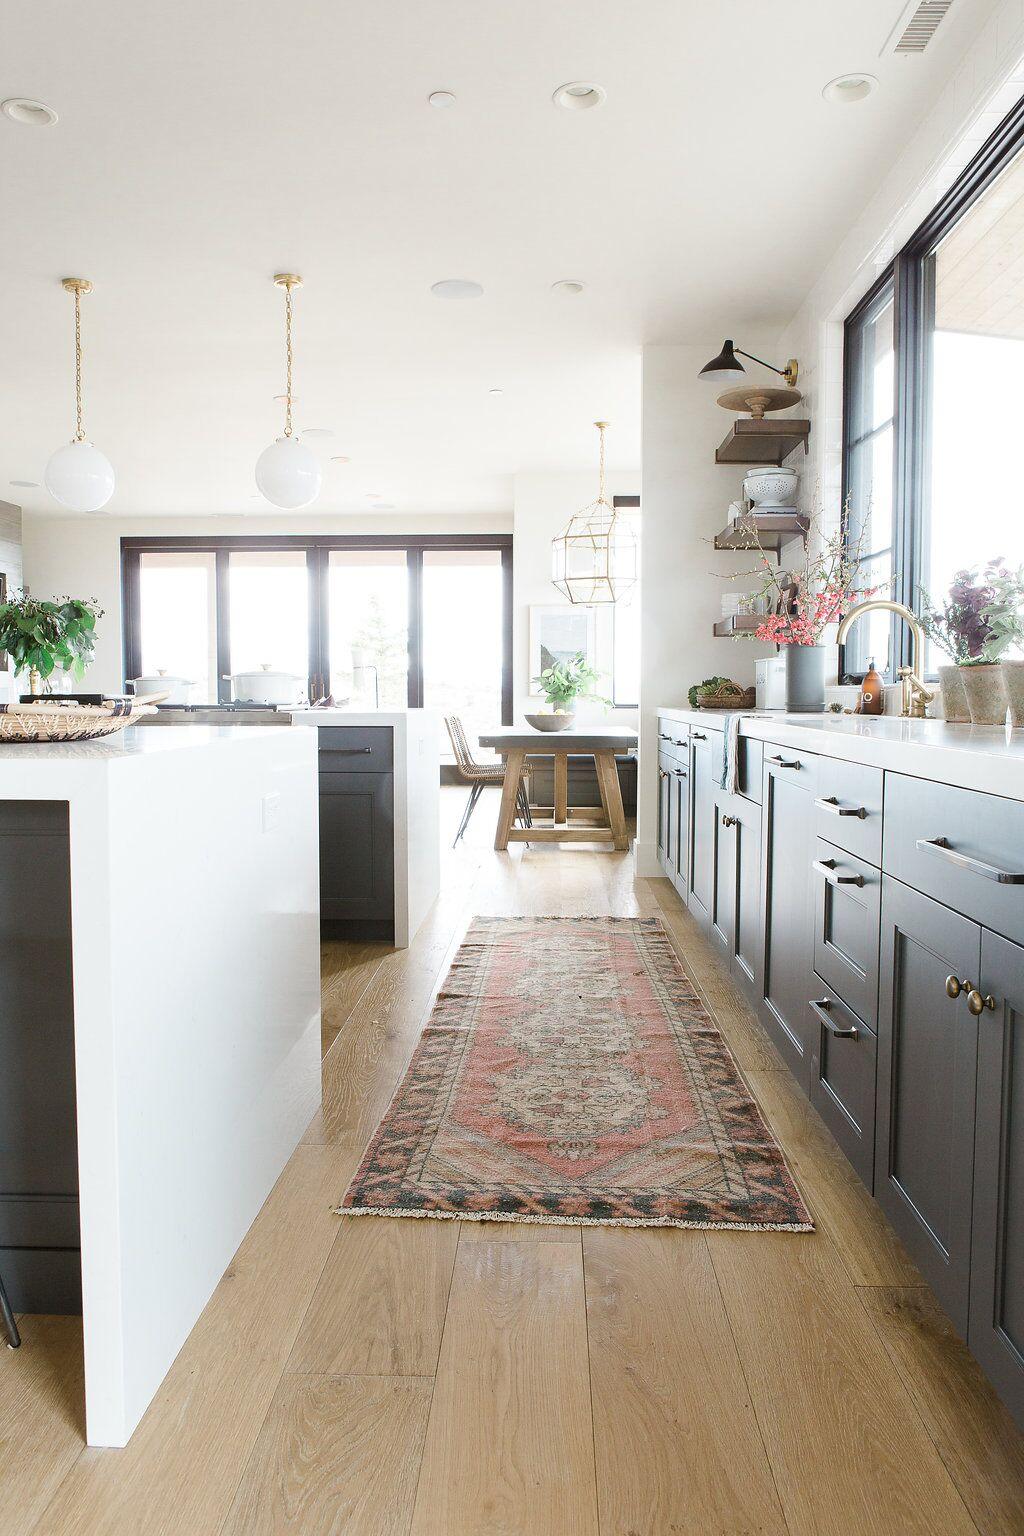 Hallway of kitchen with woven rug on floor